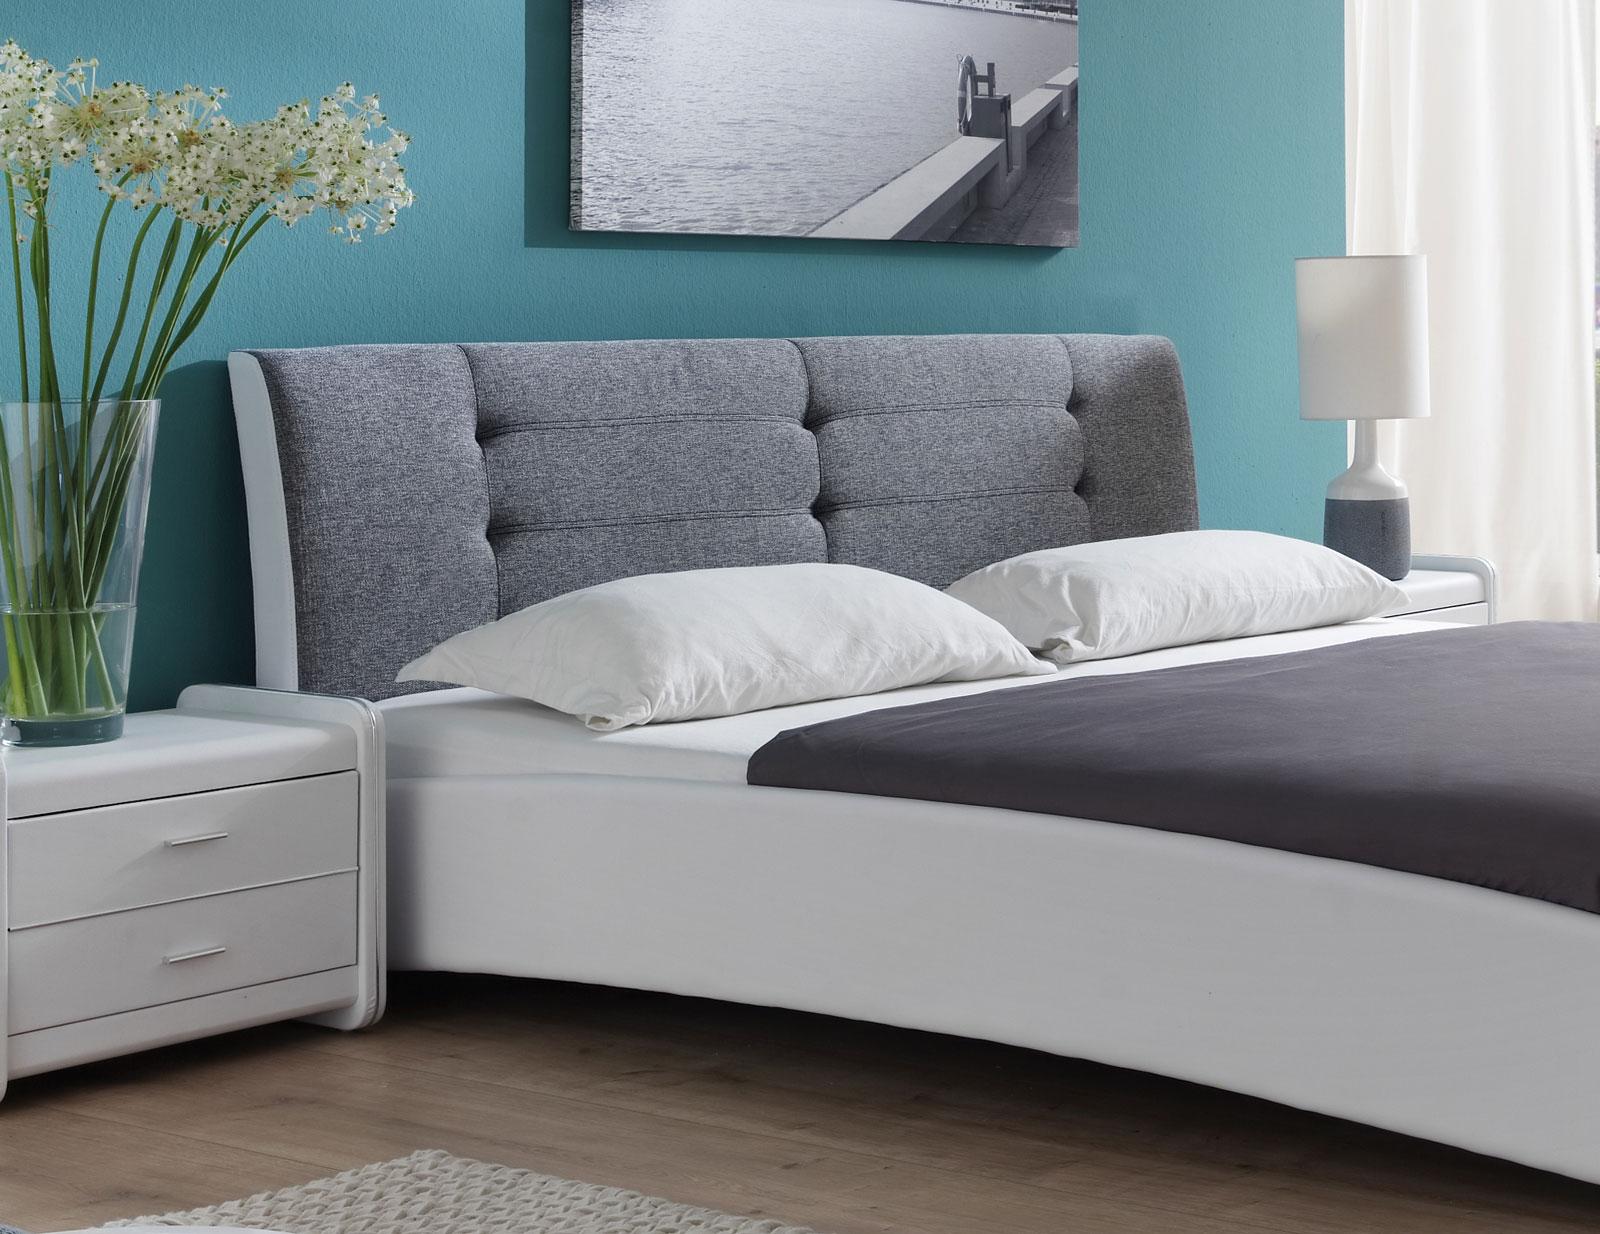 sam polsterbett doppelbett 140 x 200 cm wei grau bebop. Black Bedroom Furniture Sets. Home Design Ideas